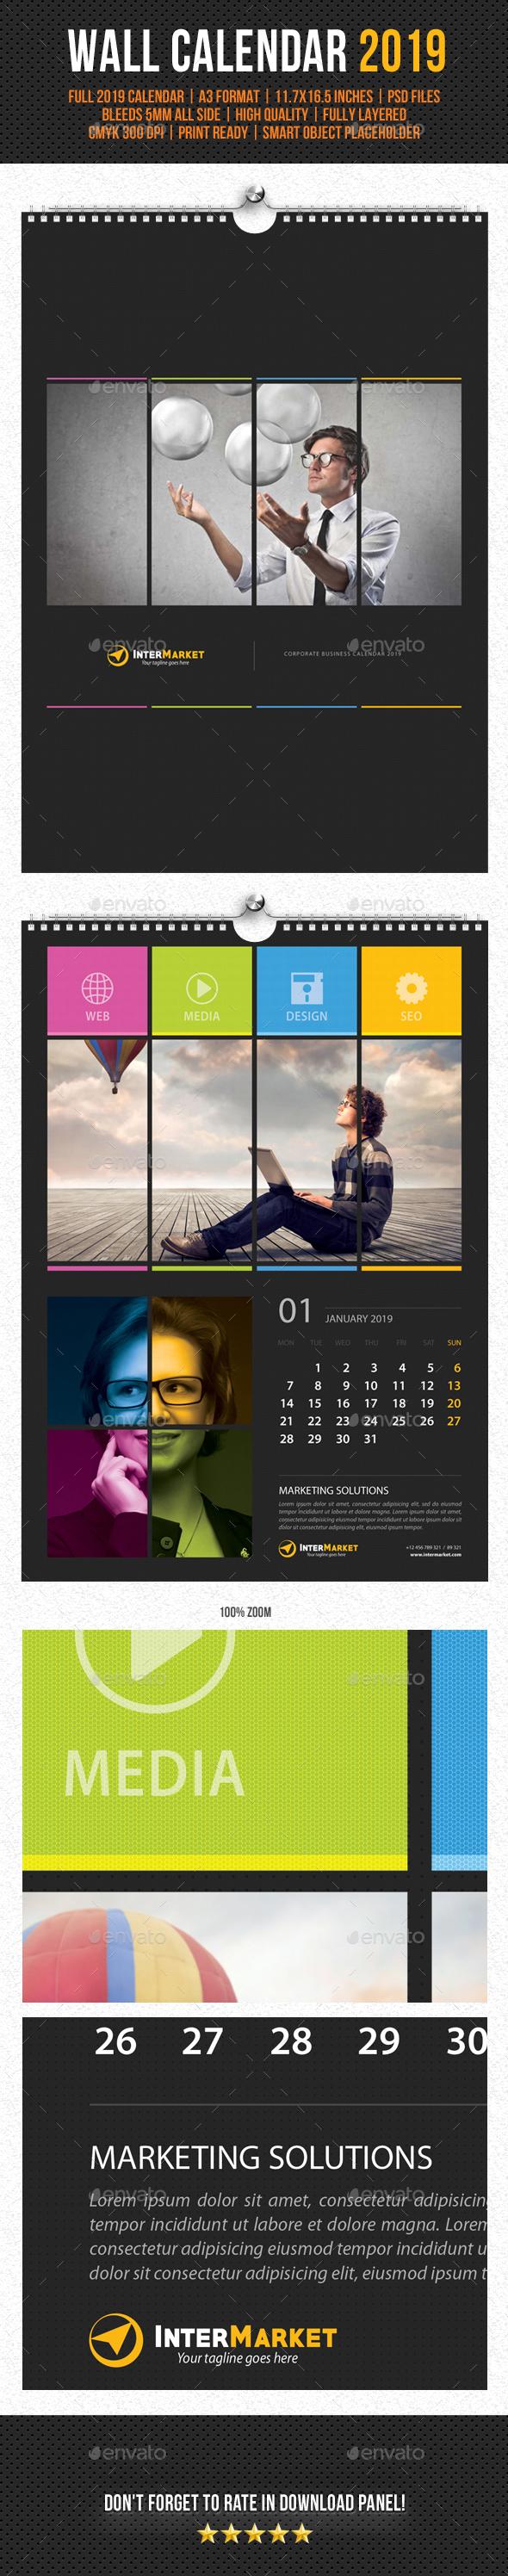 Corporate Wall Calendar 2019 V04 - Calendars Stationery